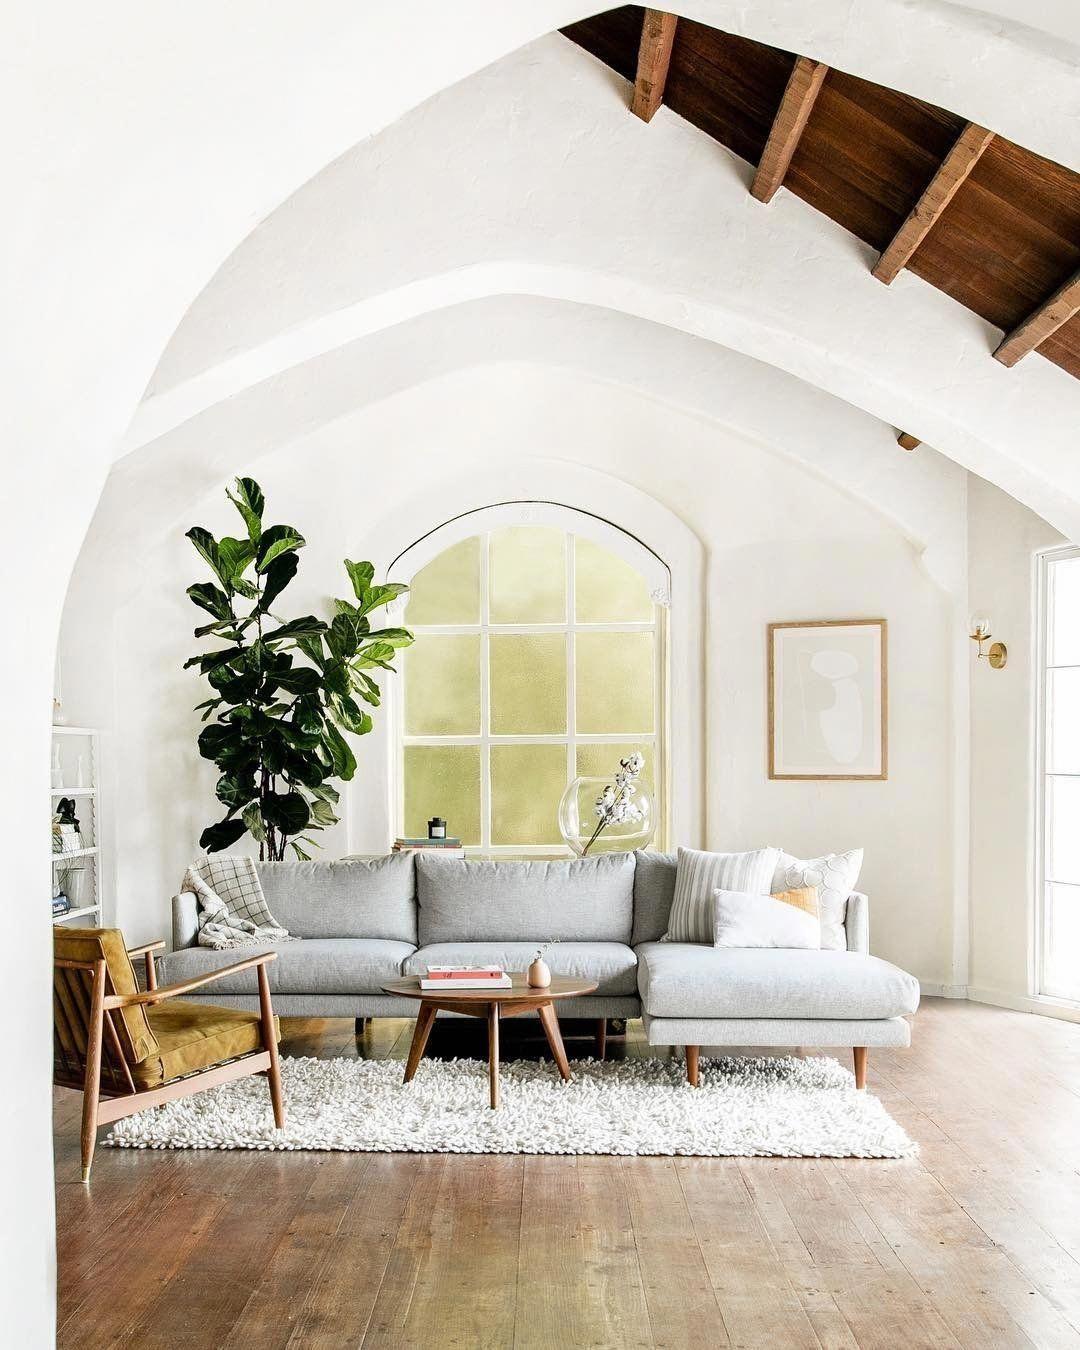 Burrard Seasalt Gray Right Sectional Sofa Retro Home Decor Scandinavian Furniture Cheap Home Decor